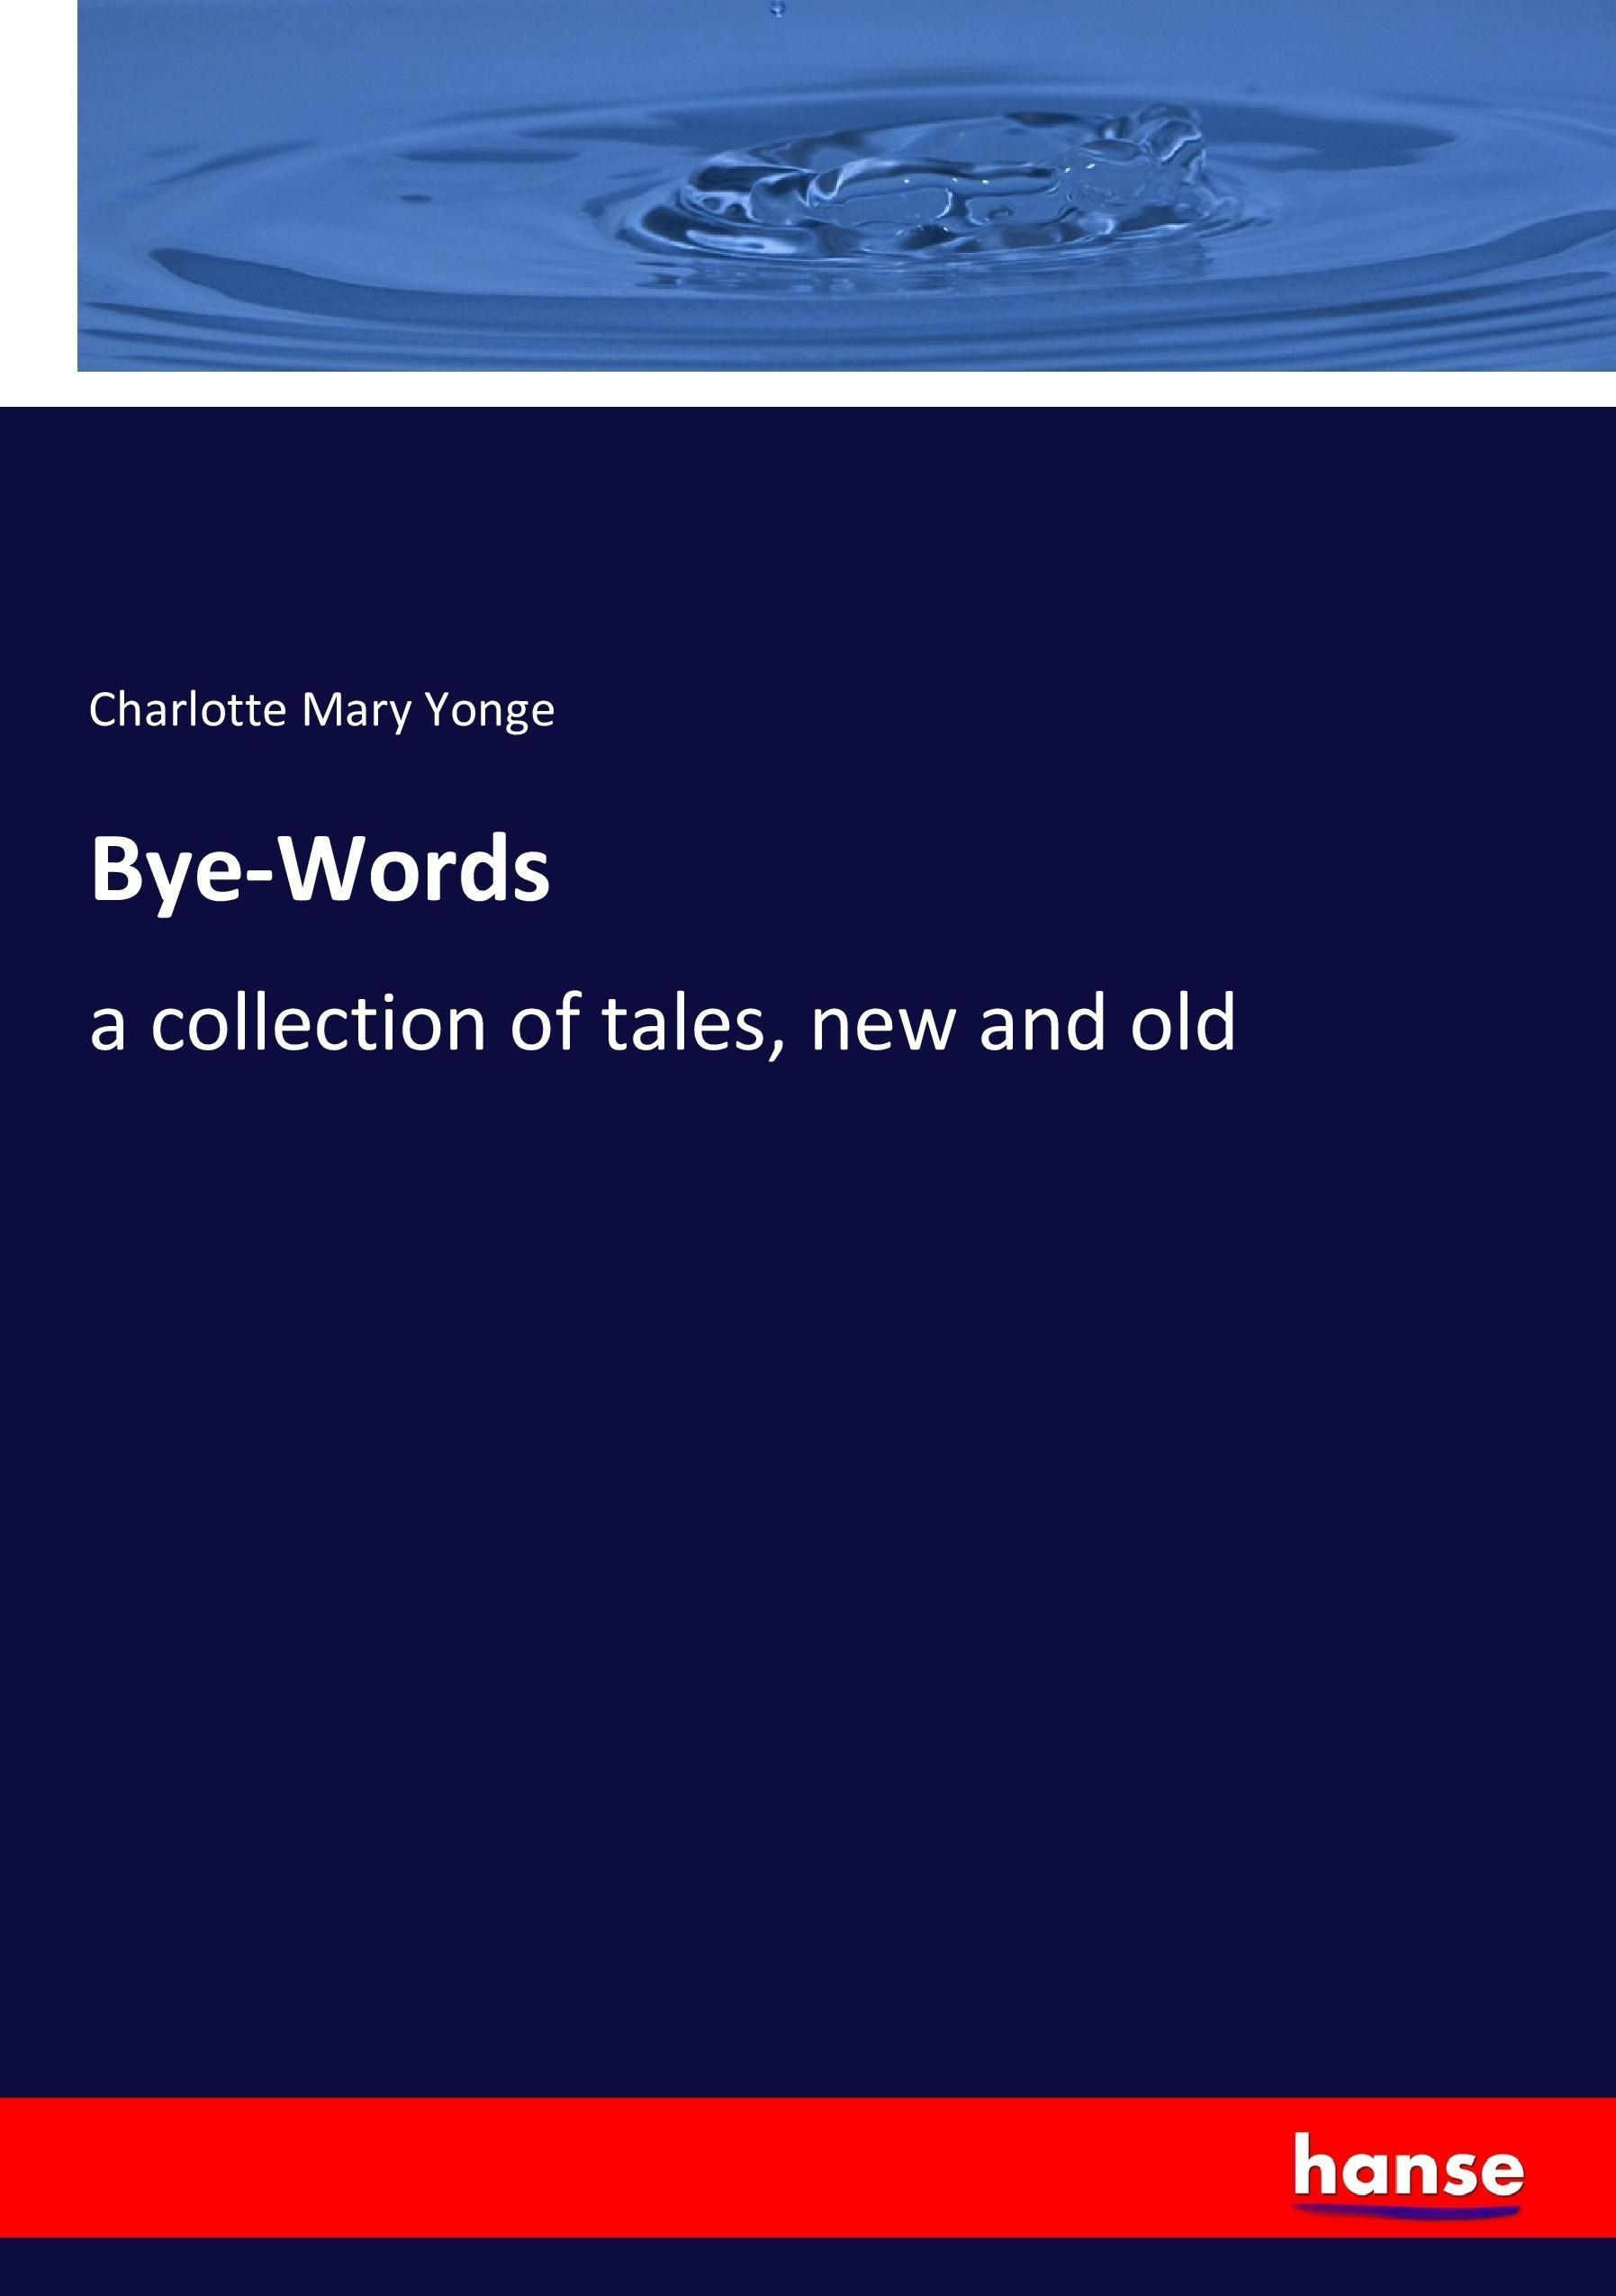 Bye-Words-Charlotte-Mary-Yonge